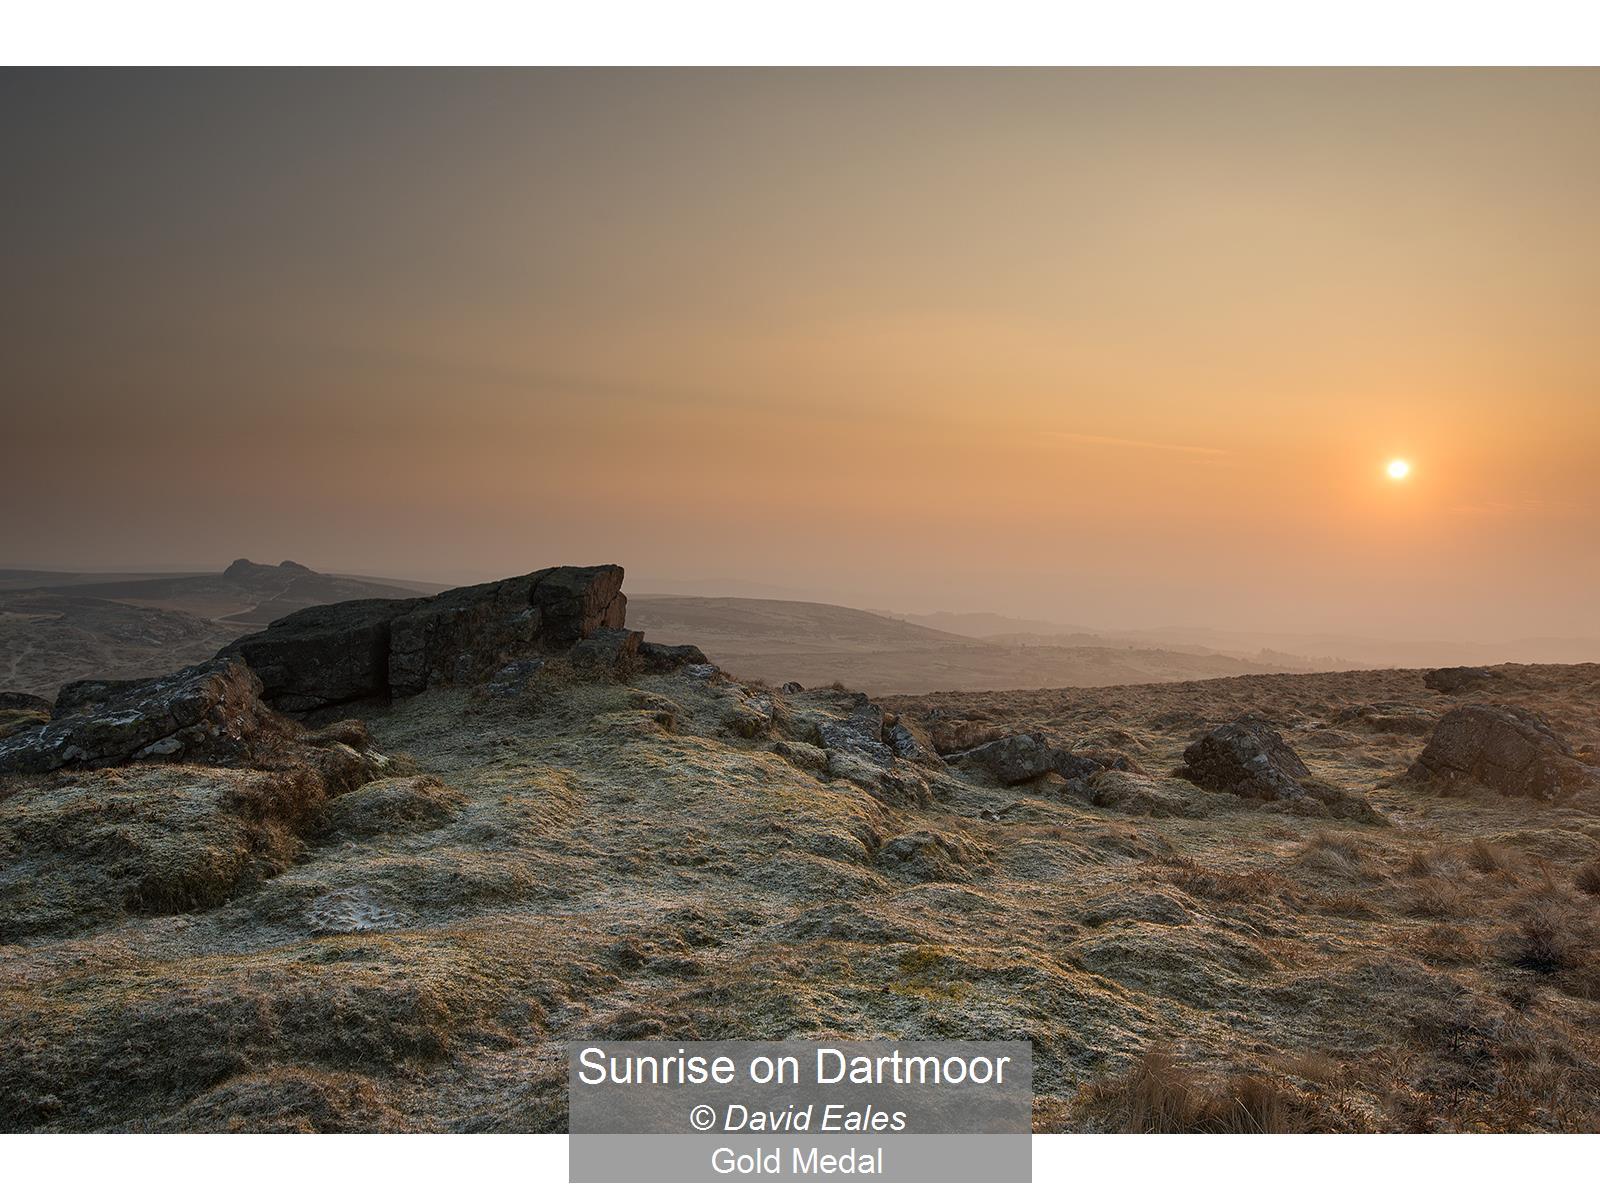 Sunrise on Dartmoor_David Eales_Gold